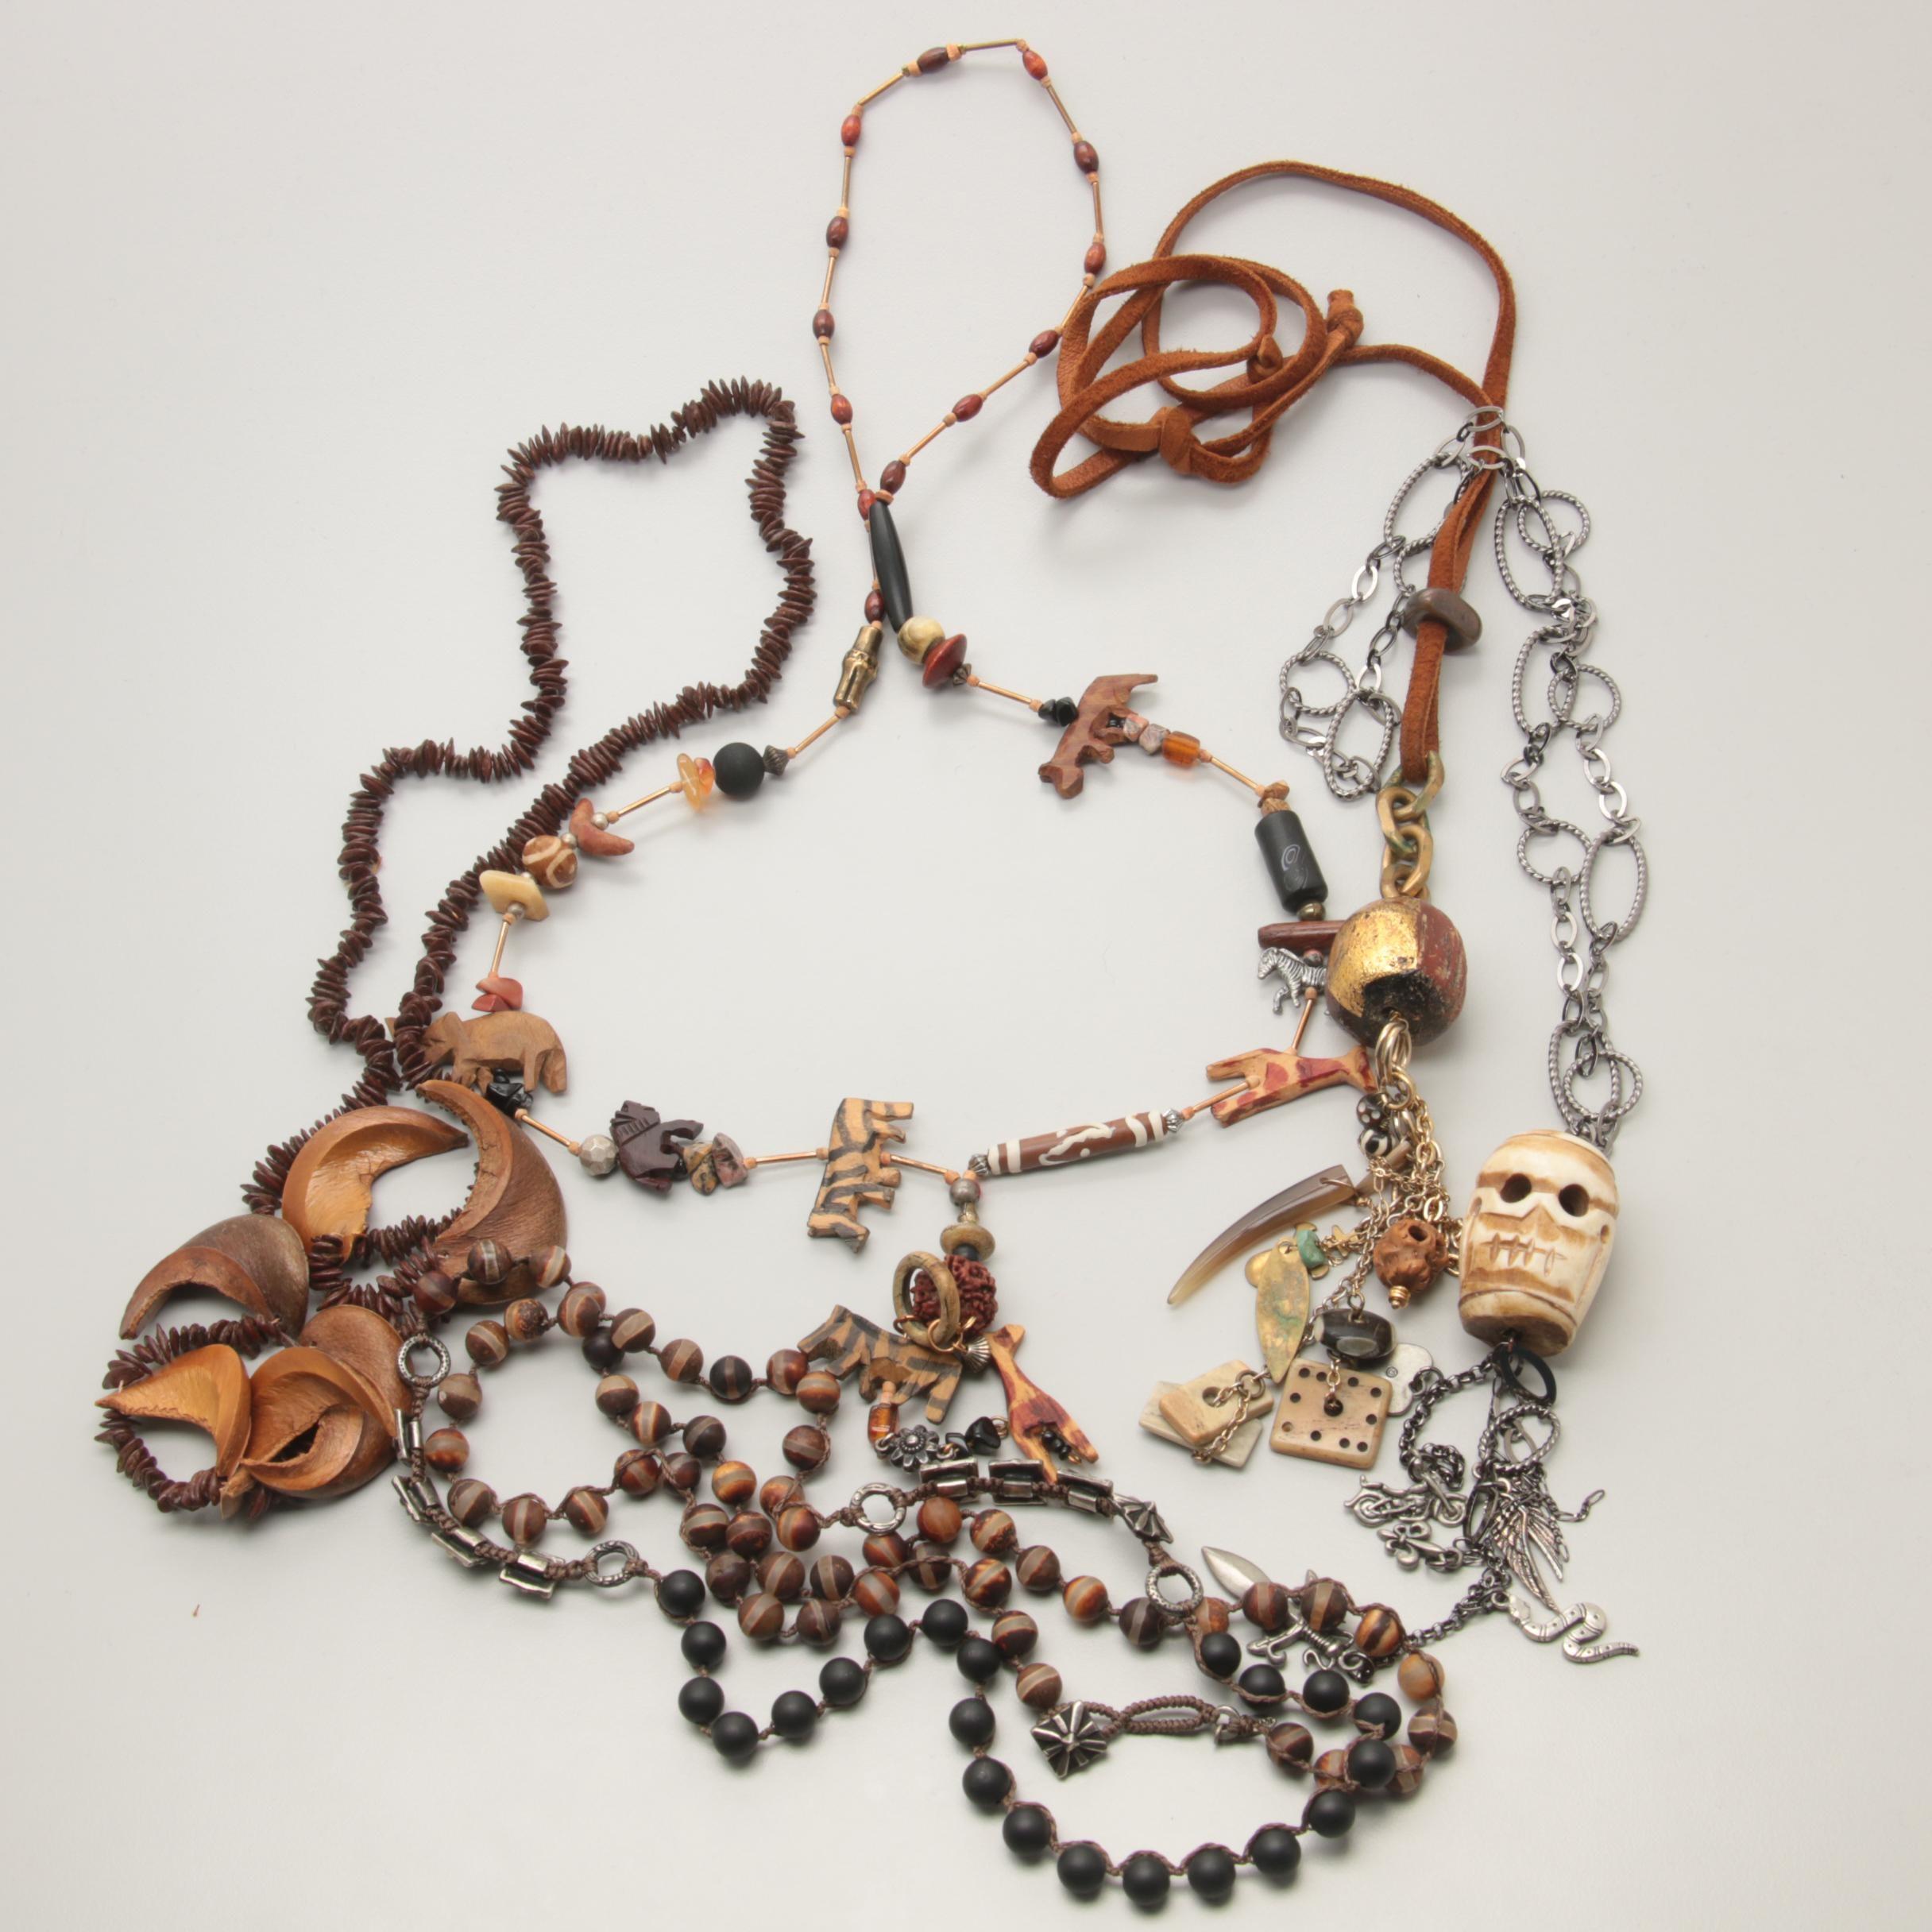 Costume Bone, Wood and Jasper Jewelry with Animal Fetish Necklace